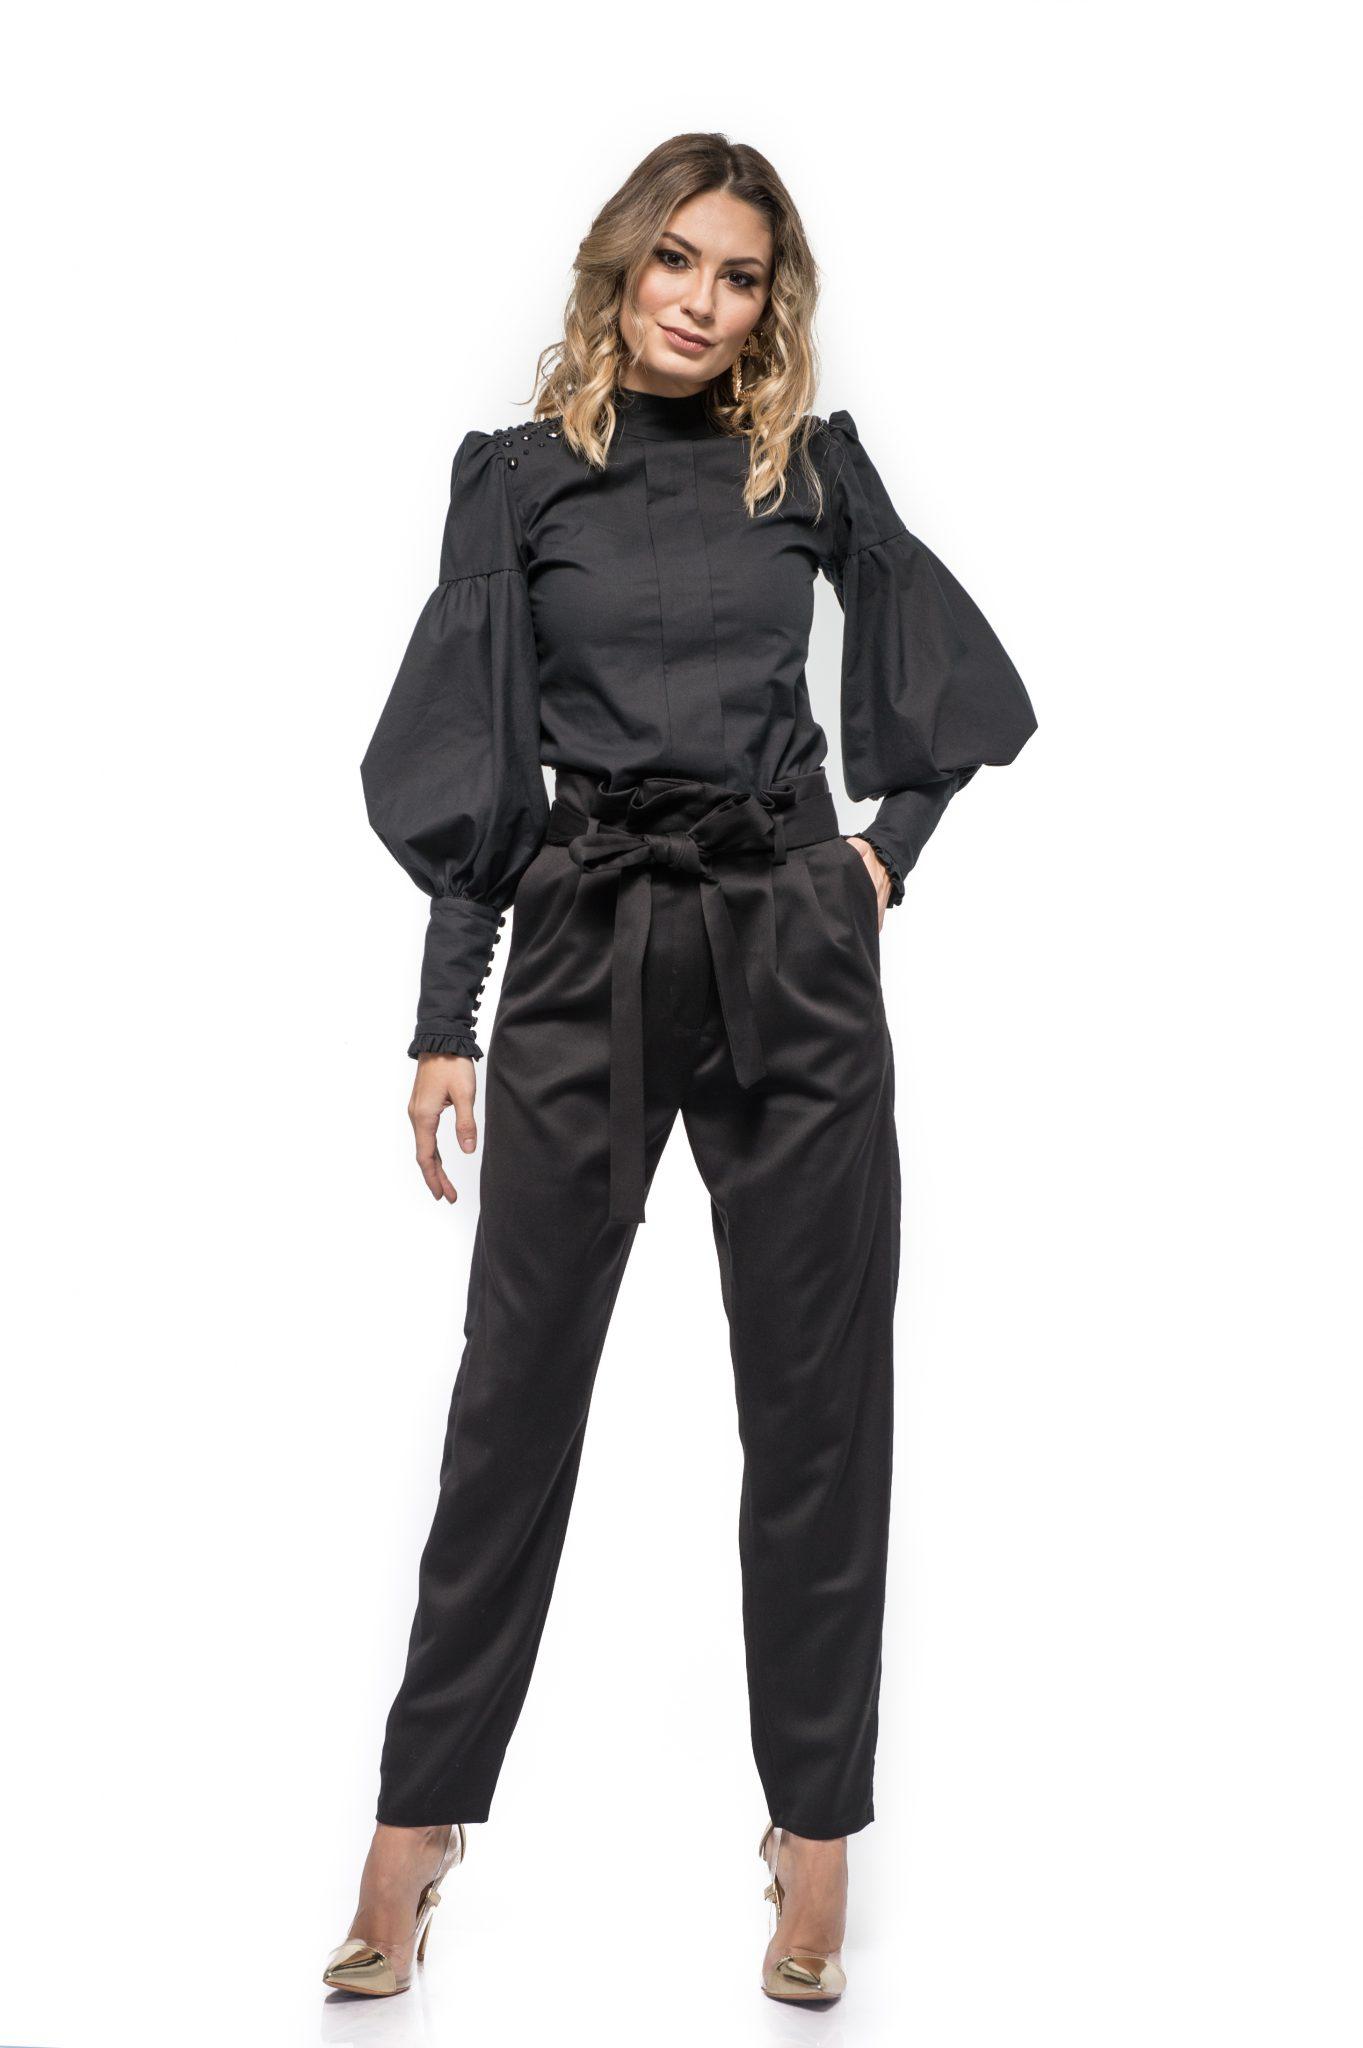 Pantaloni REMA 1. Poza primara